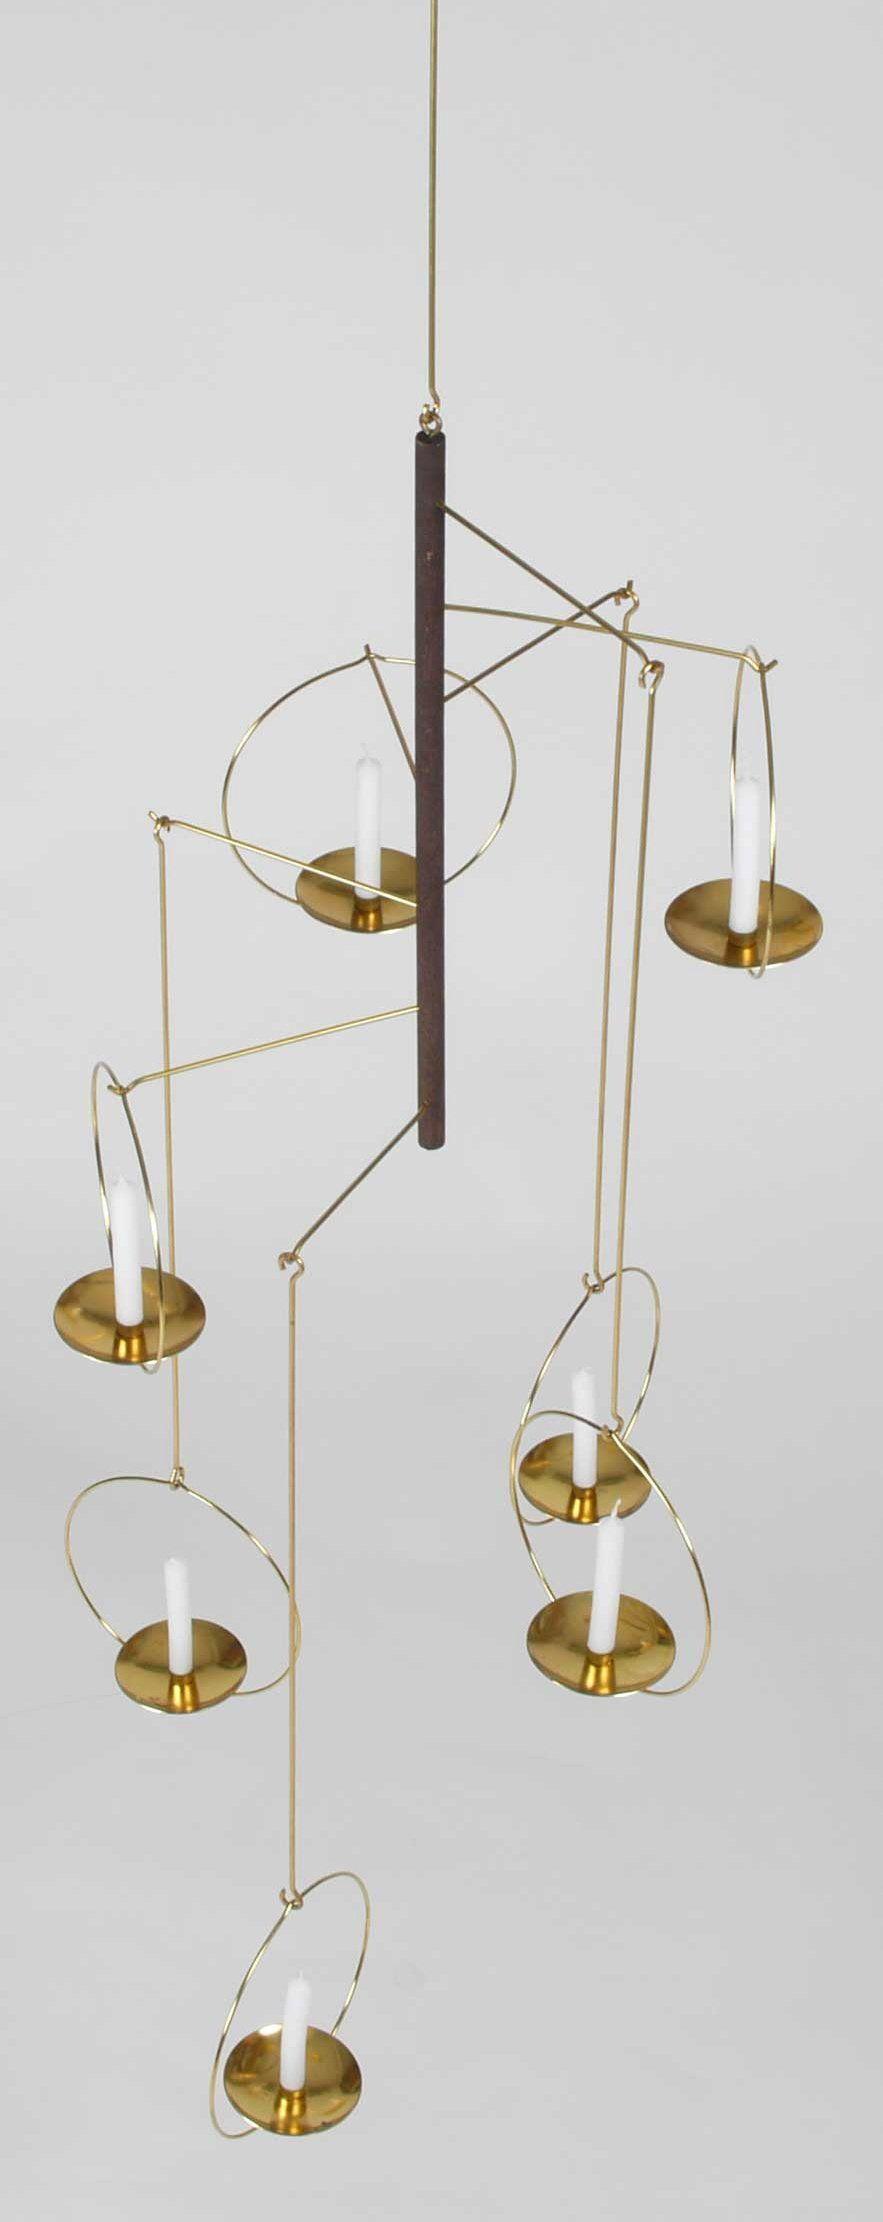 Timo sarpaneva brass candle mobile for raija aarikka ss